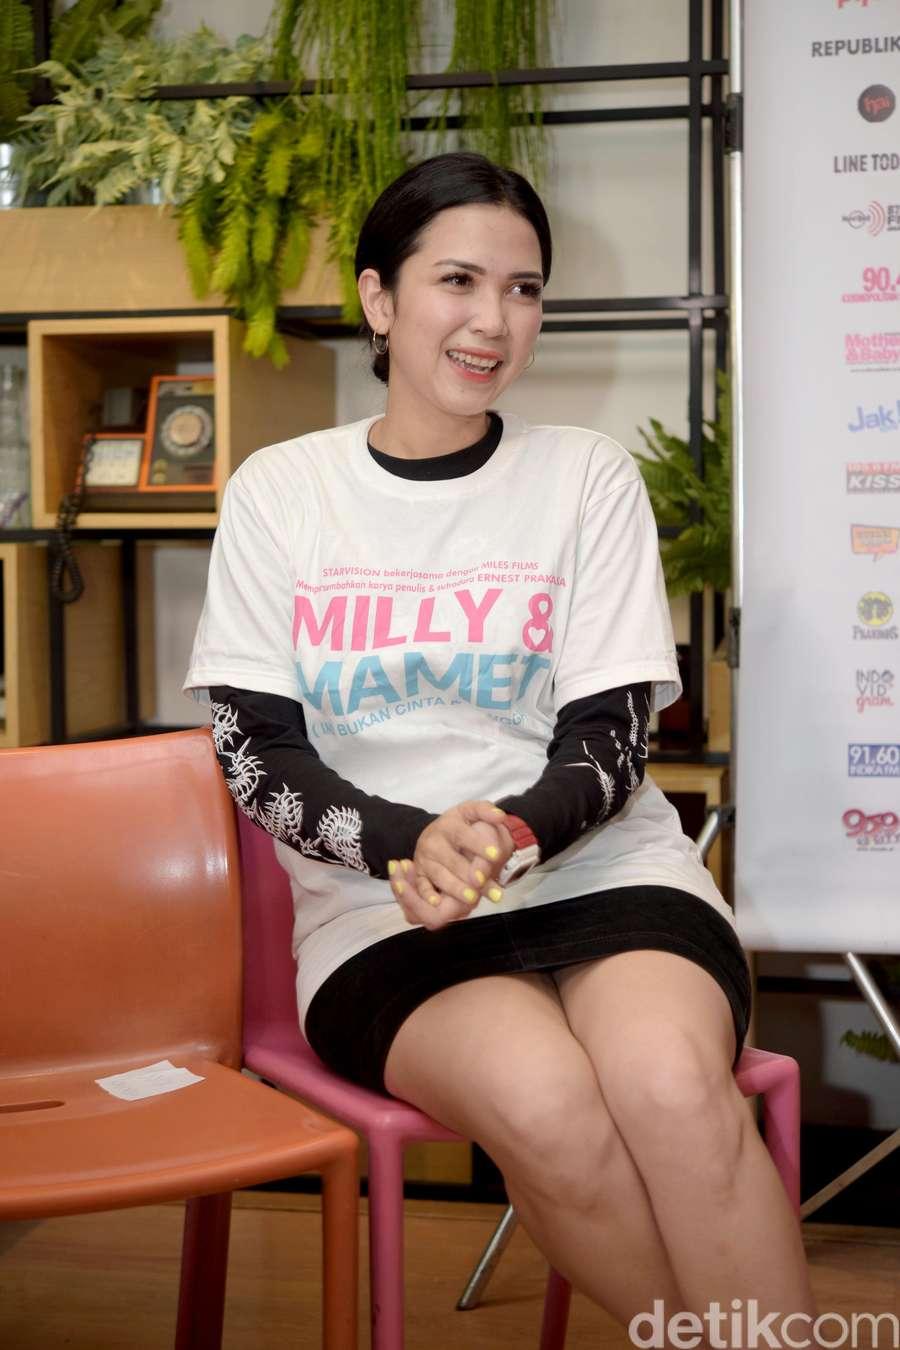 Milly & Mamet Tembus 1 Juta, Dinda Kanya Dewi Happy Banget